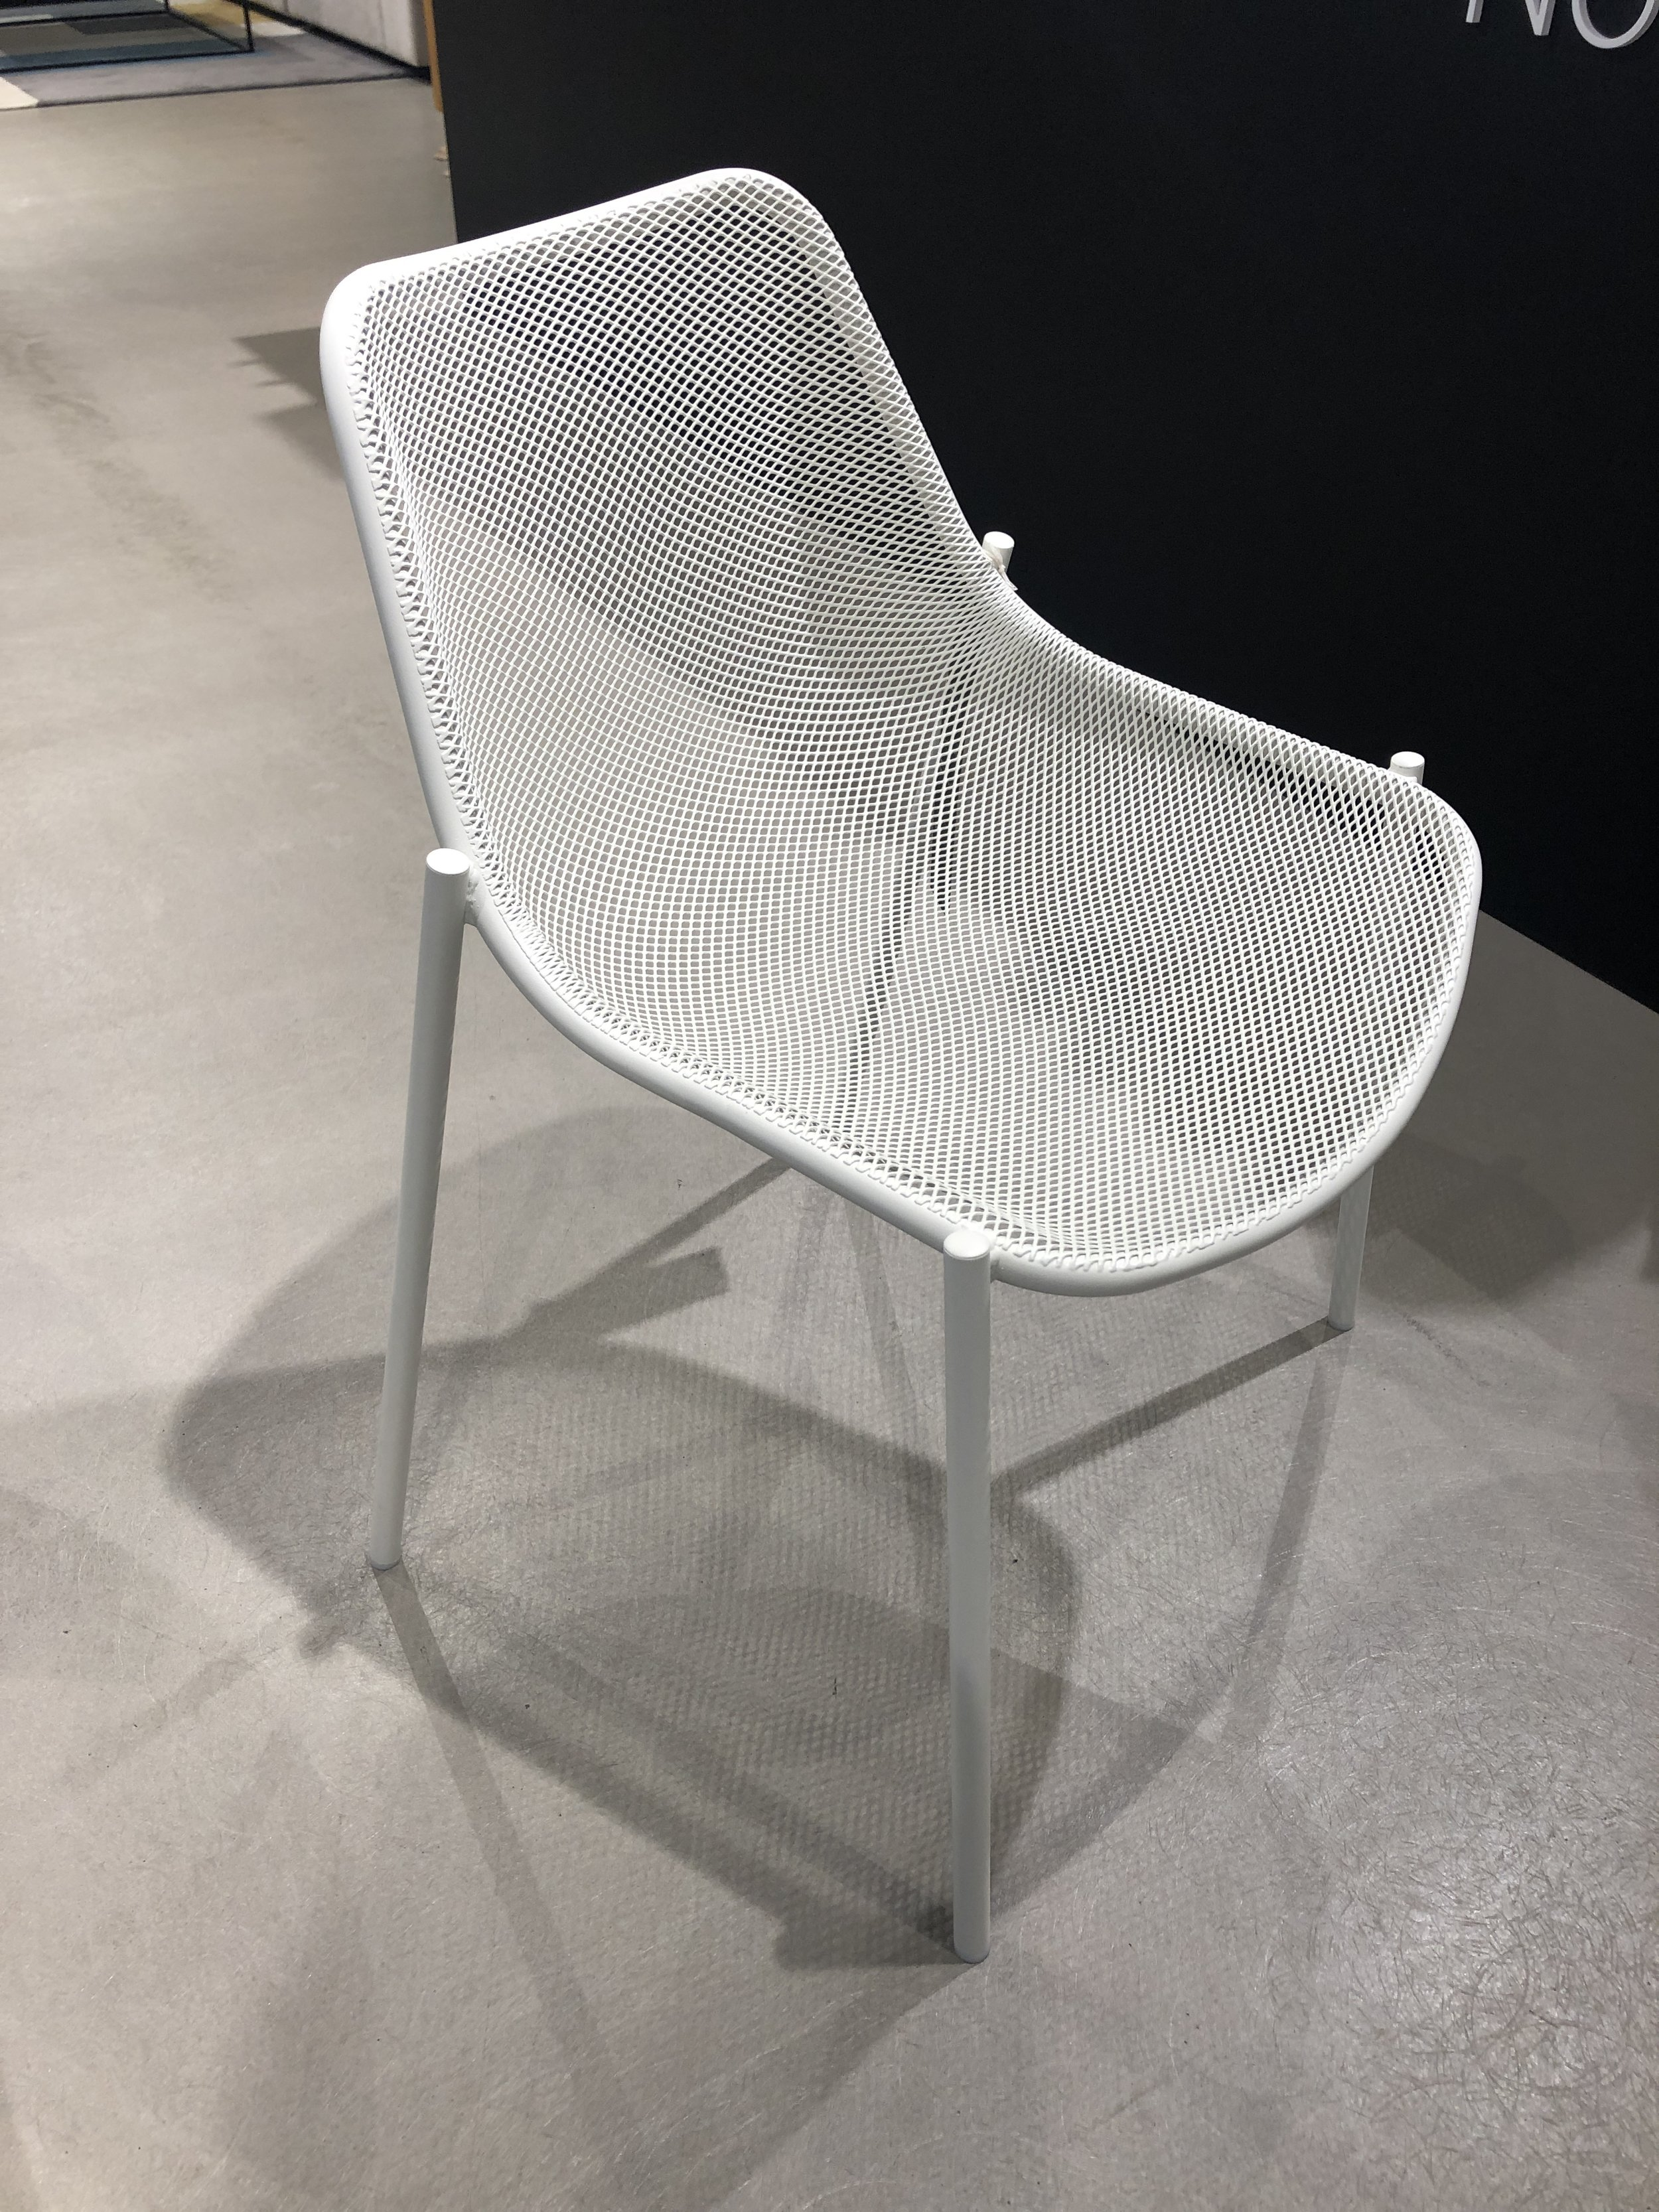 Round stol: -**% - Selges parvis 2, 4 eller 6 stk